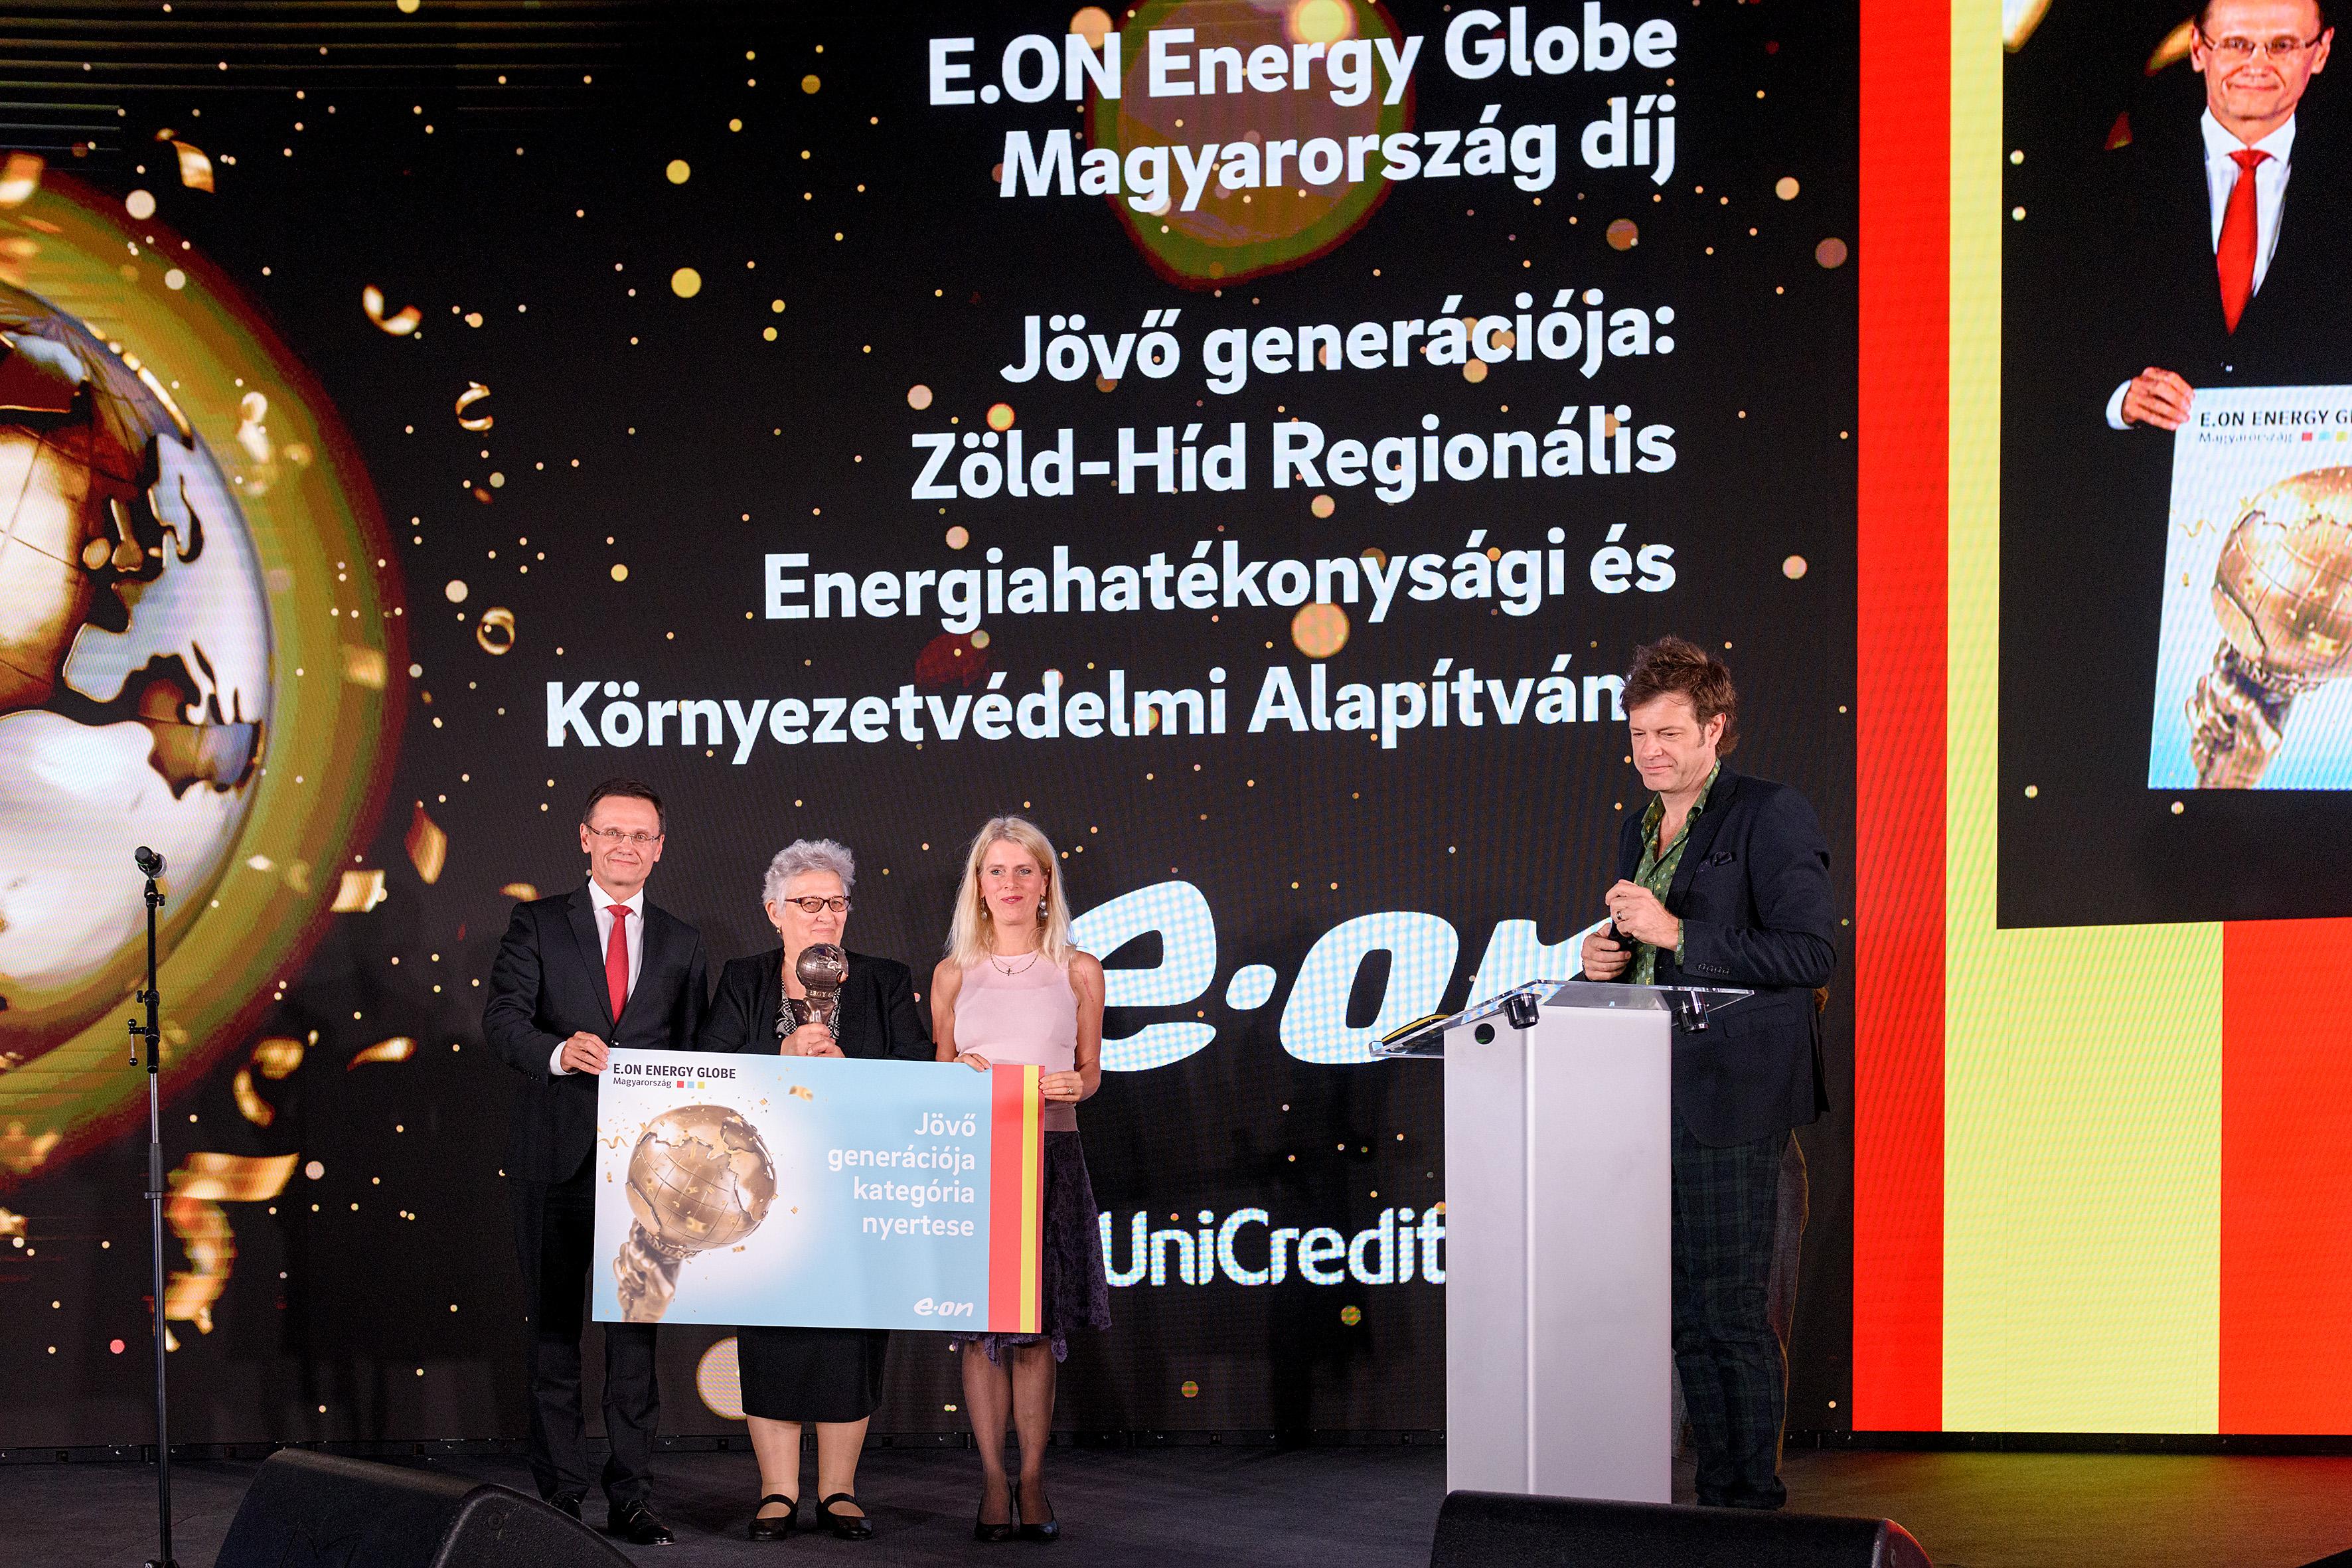 eon_energy_globe_148.jpg